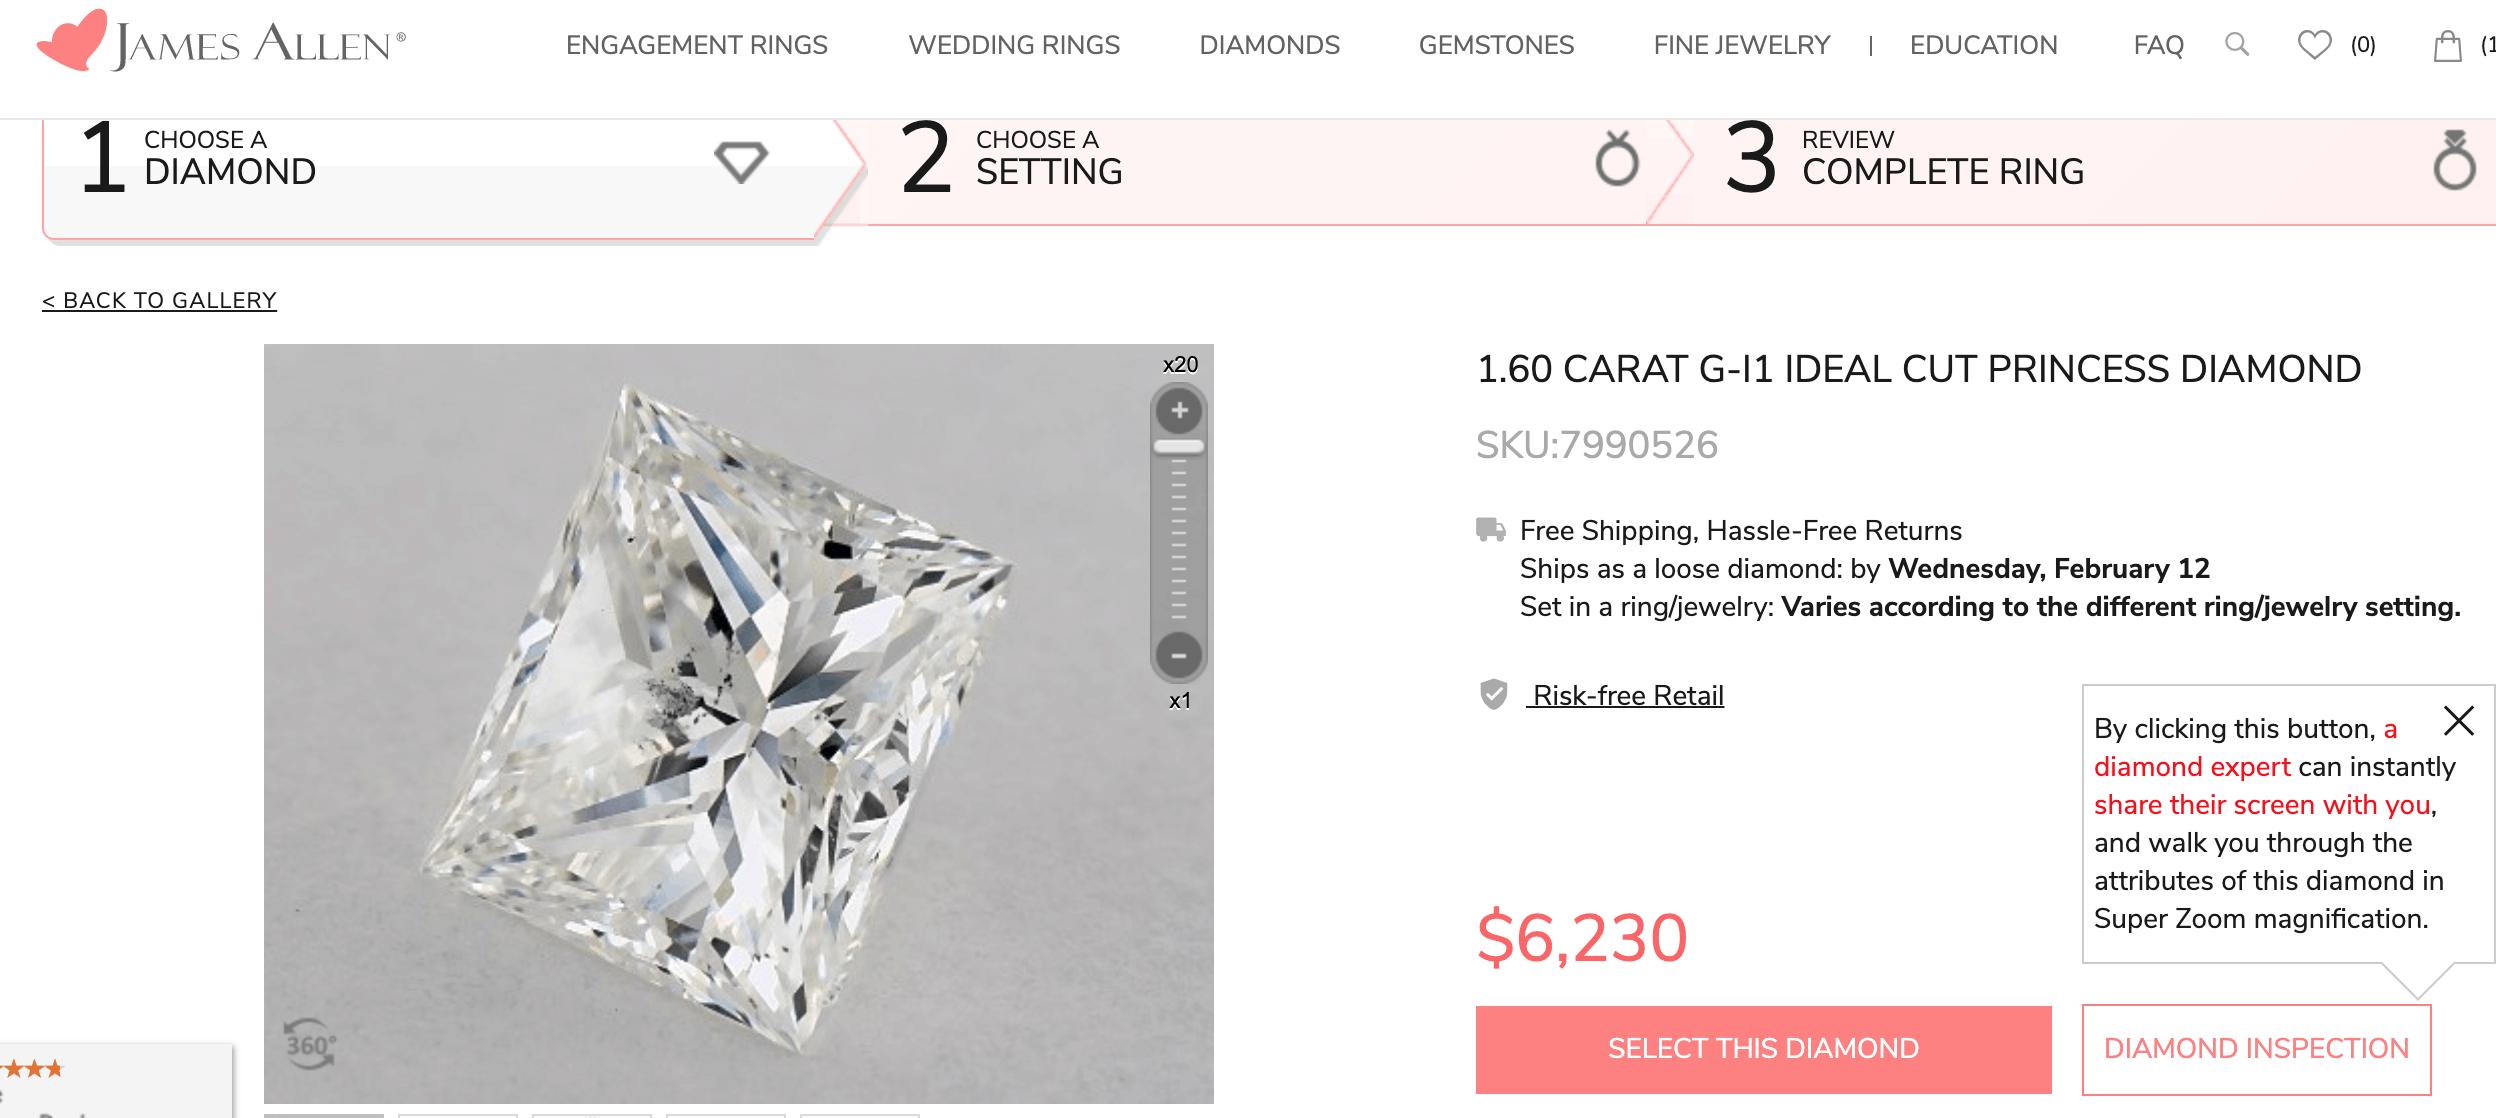 James Allen diamond